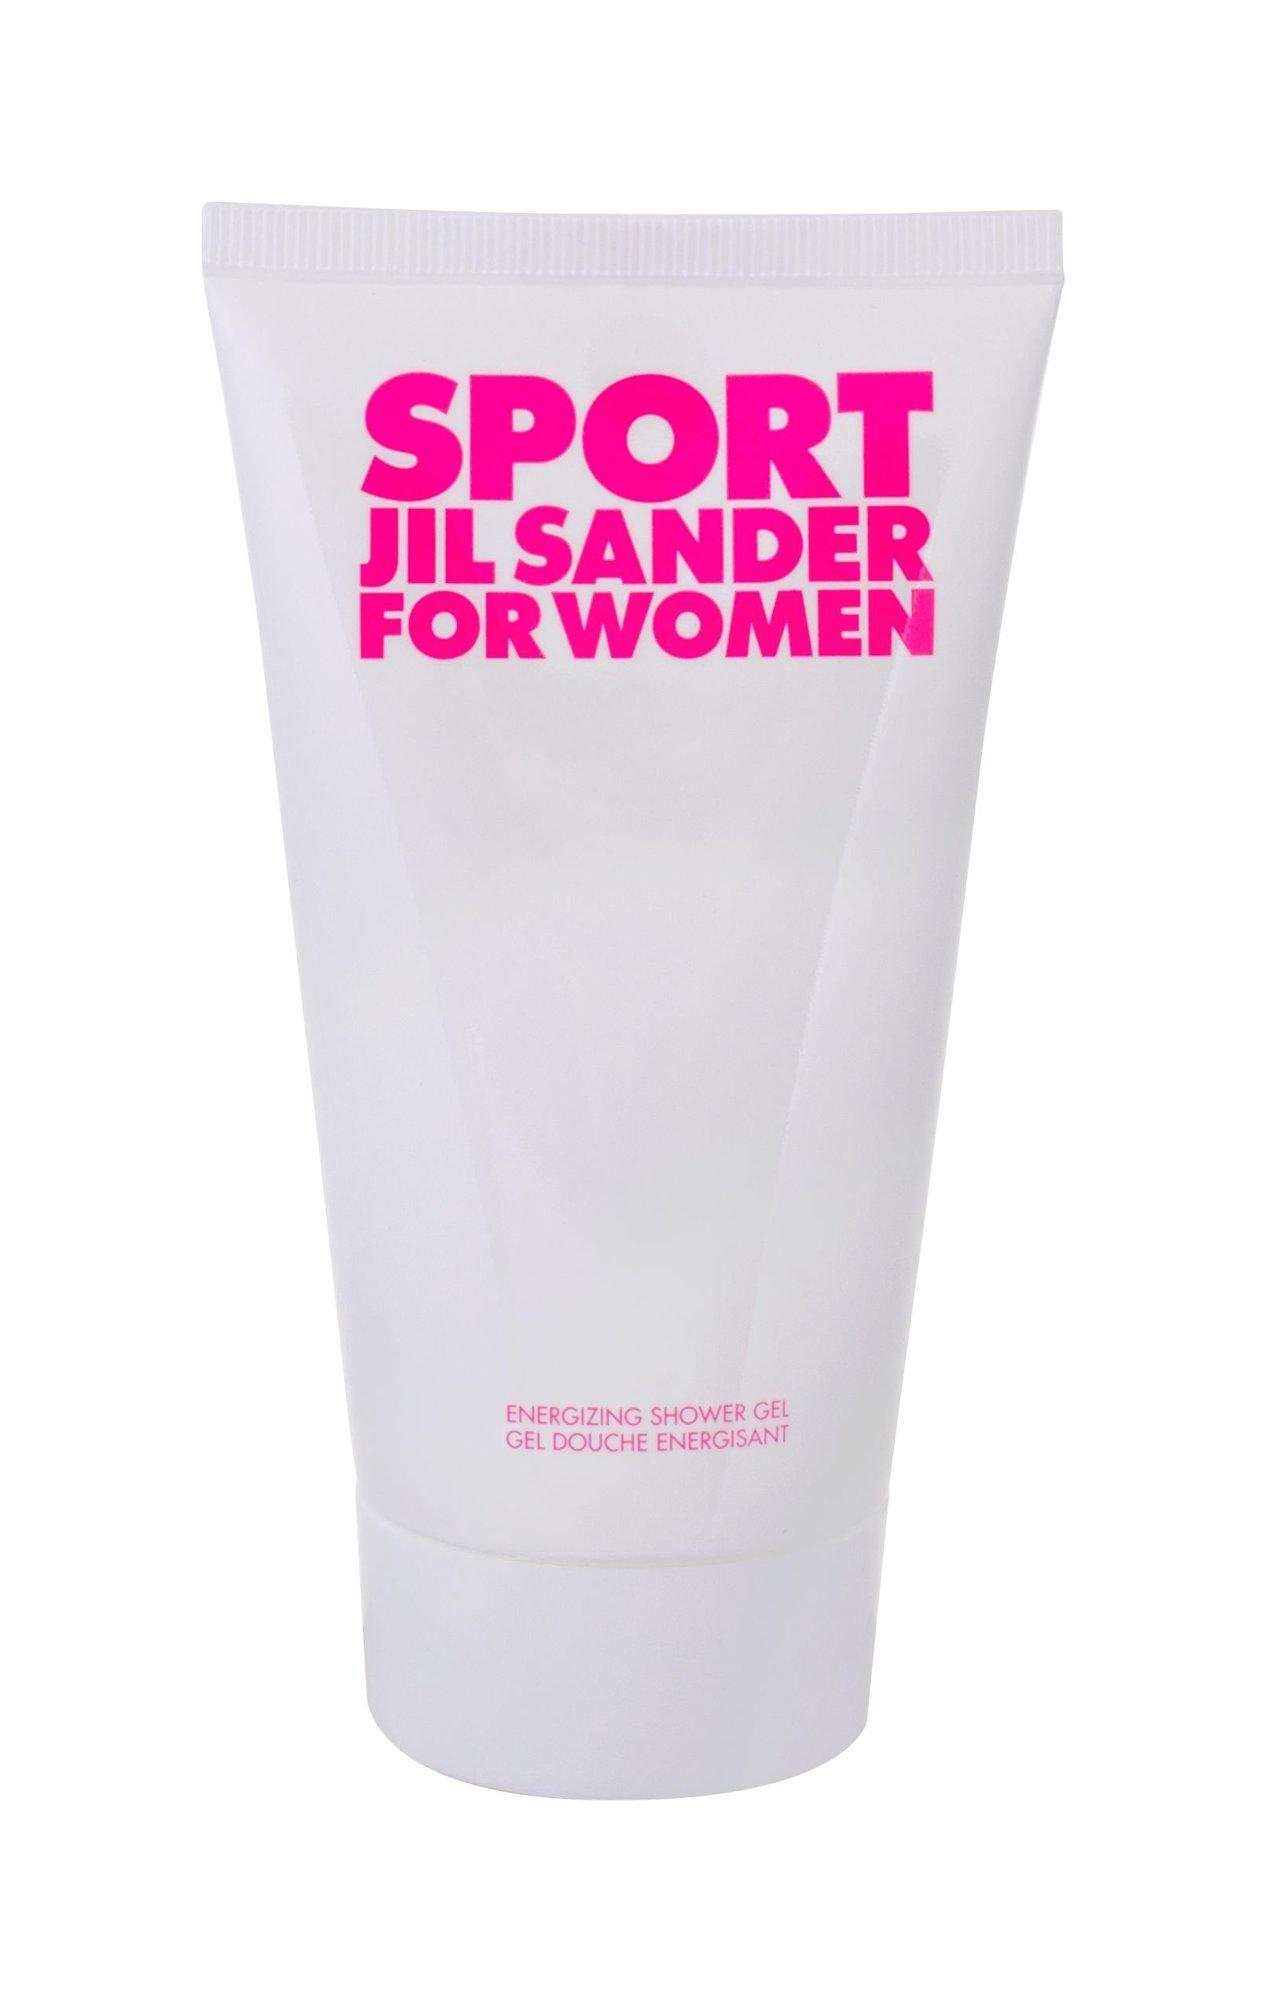 Jil Sander Sport For Women Shower Gel 150ml